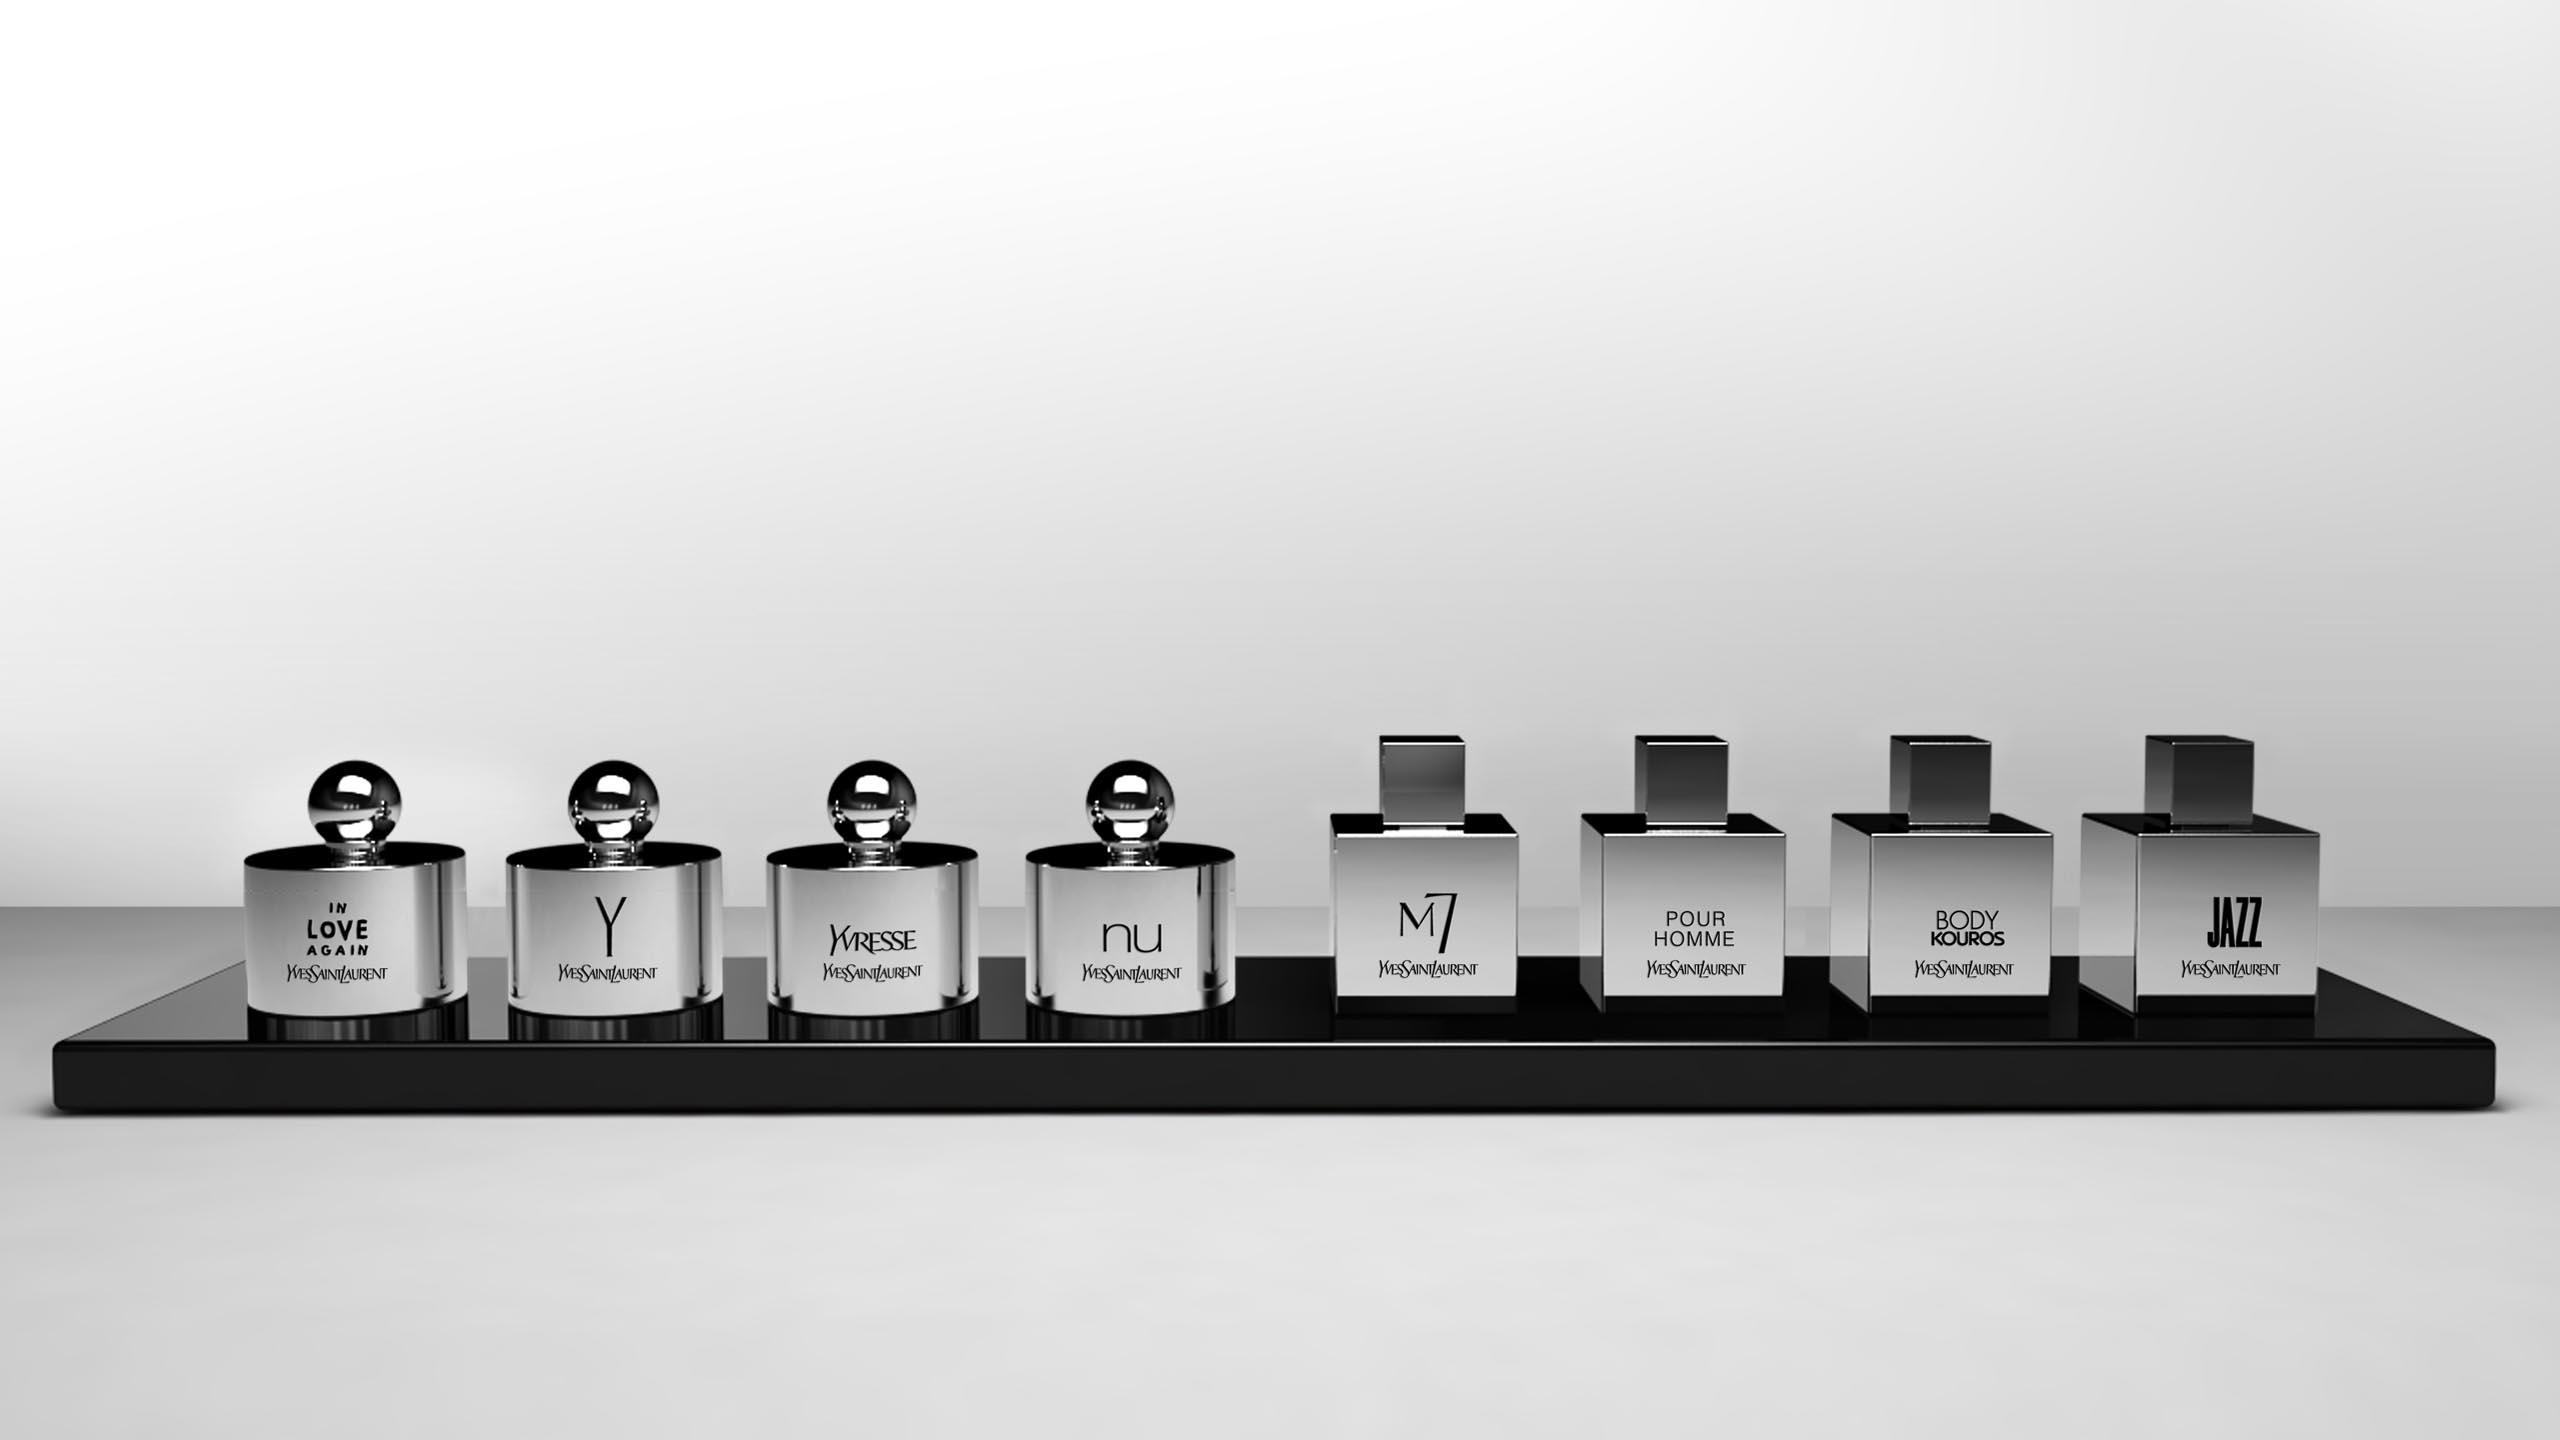 Yves Saint Laurent, YSL, La Collection YSL, perfume, packaging design